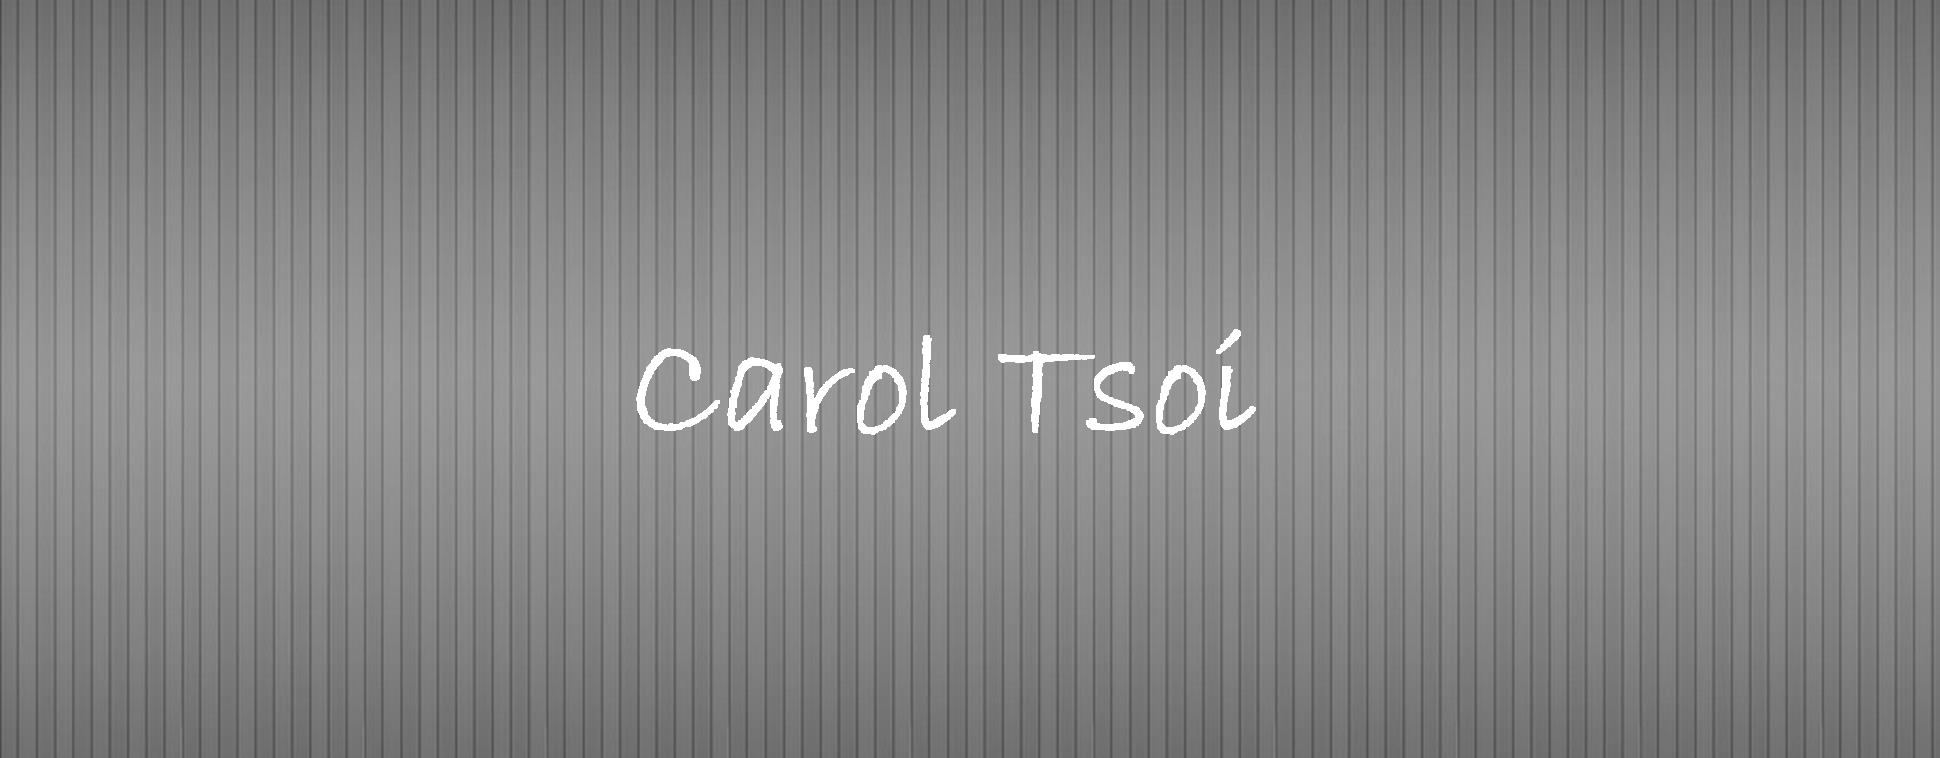 Carol Tsoi.jpg